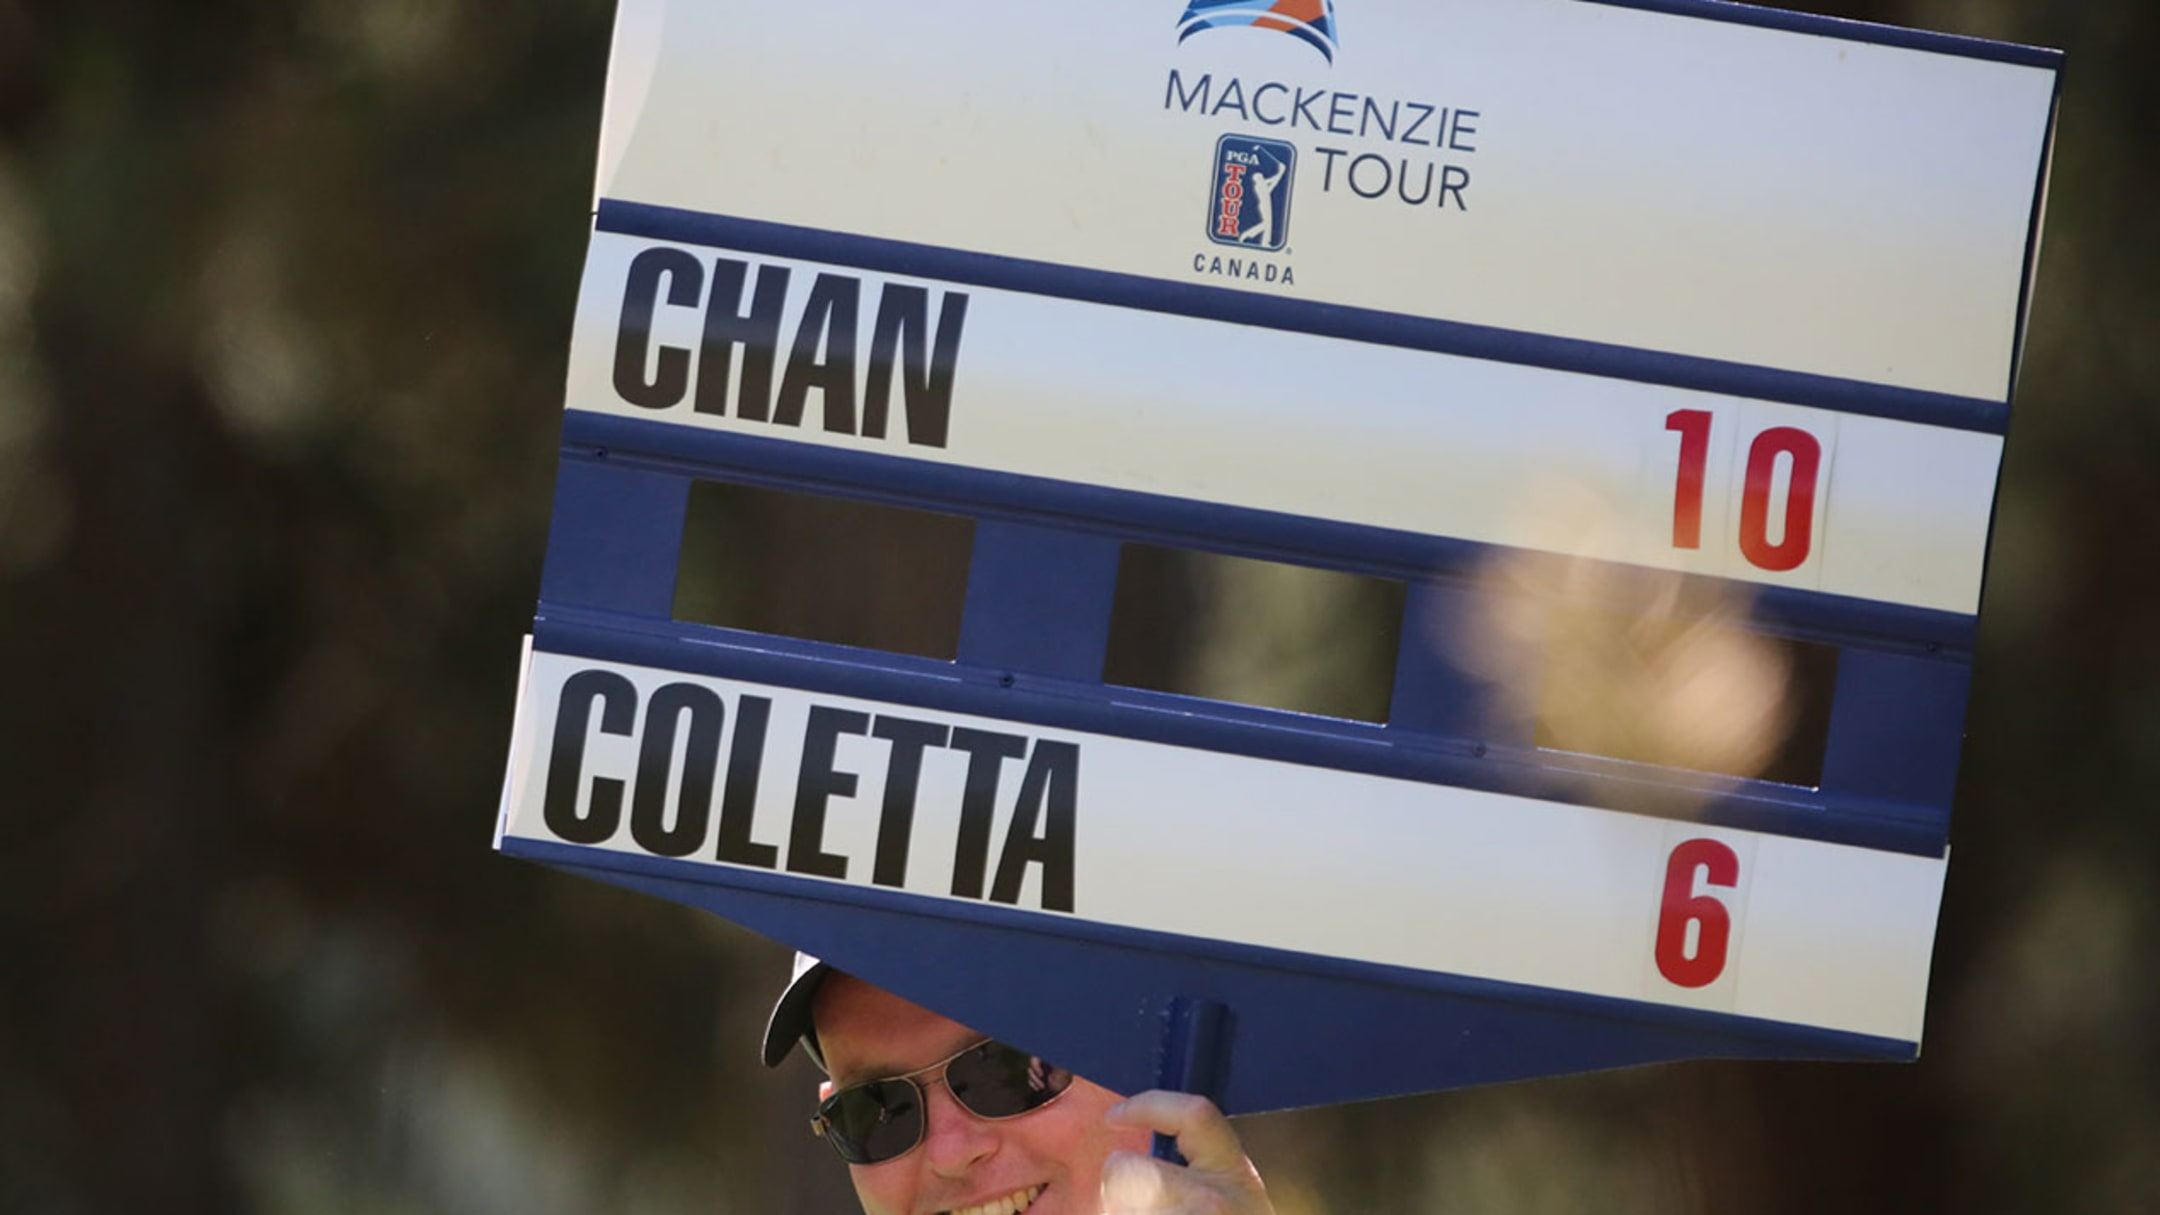 Pga Tour Monday Qualifying 2020 2019 Mackenzie Tour Monday qualifying information